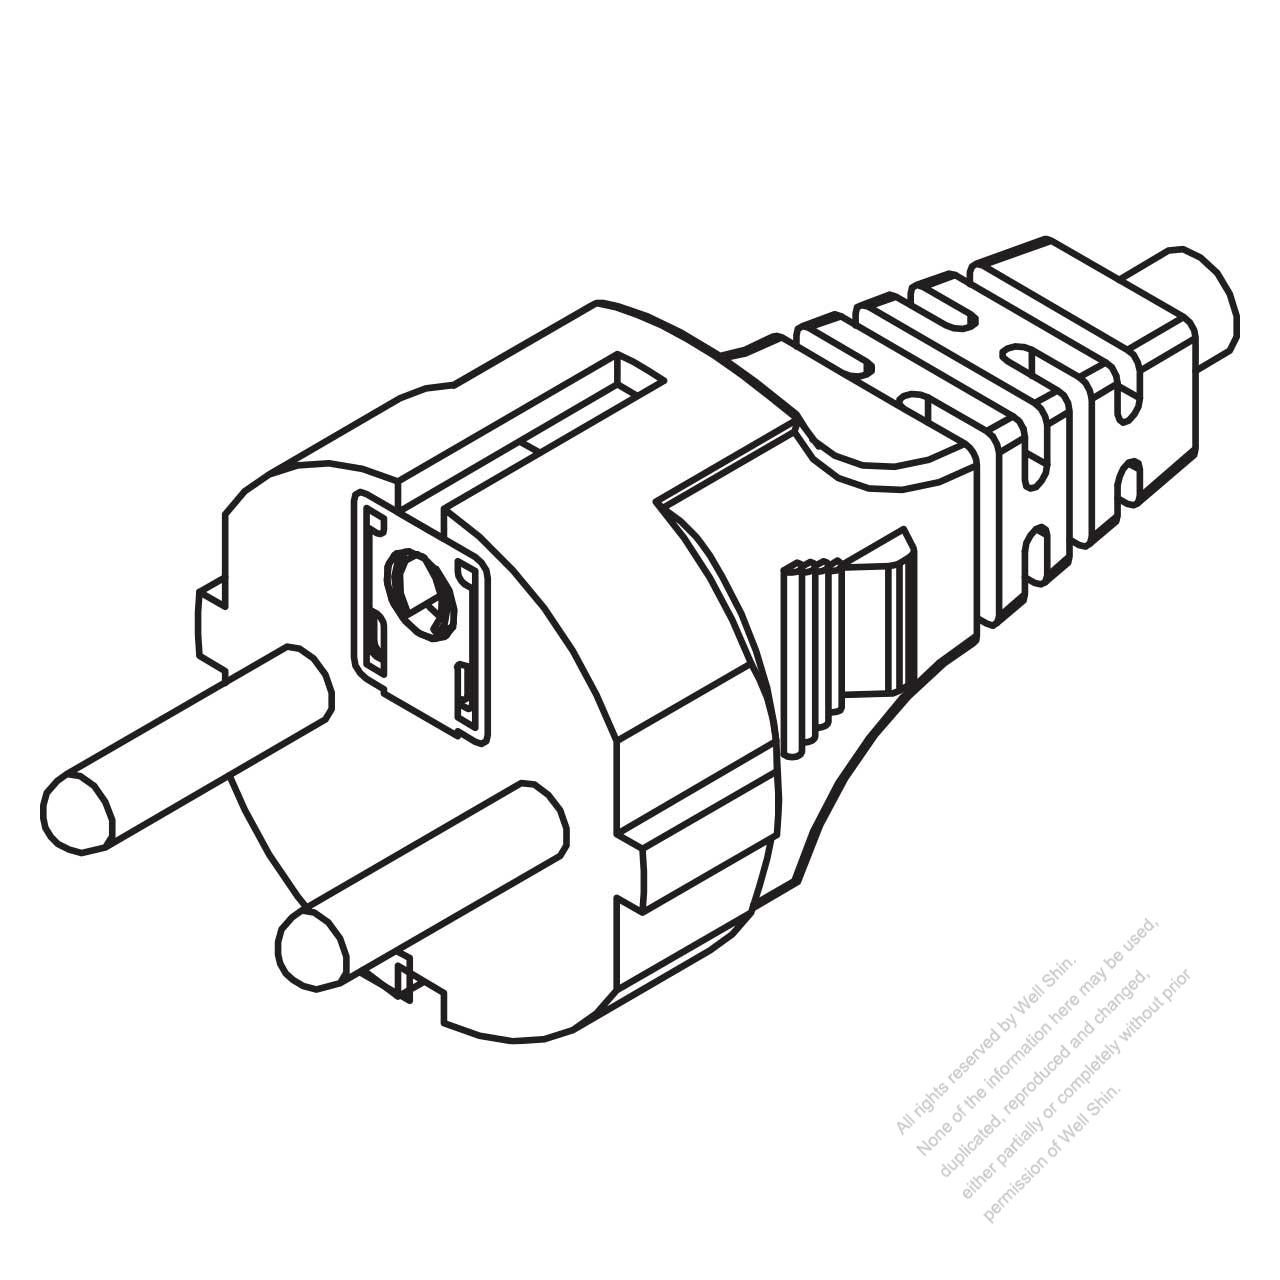 germany 3 pin straight ac plug 10 16a 250v well shin technology AC Wall Plug germany 3 pin straight ac plug 10 16a 250v